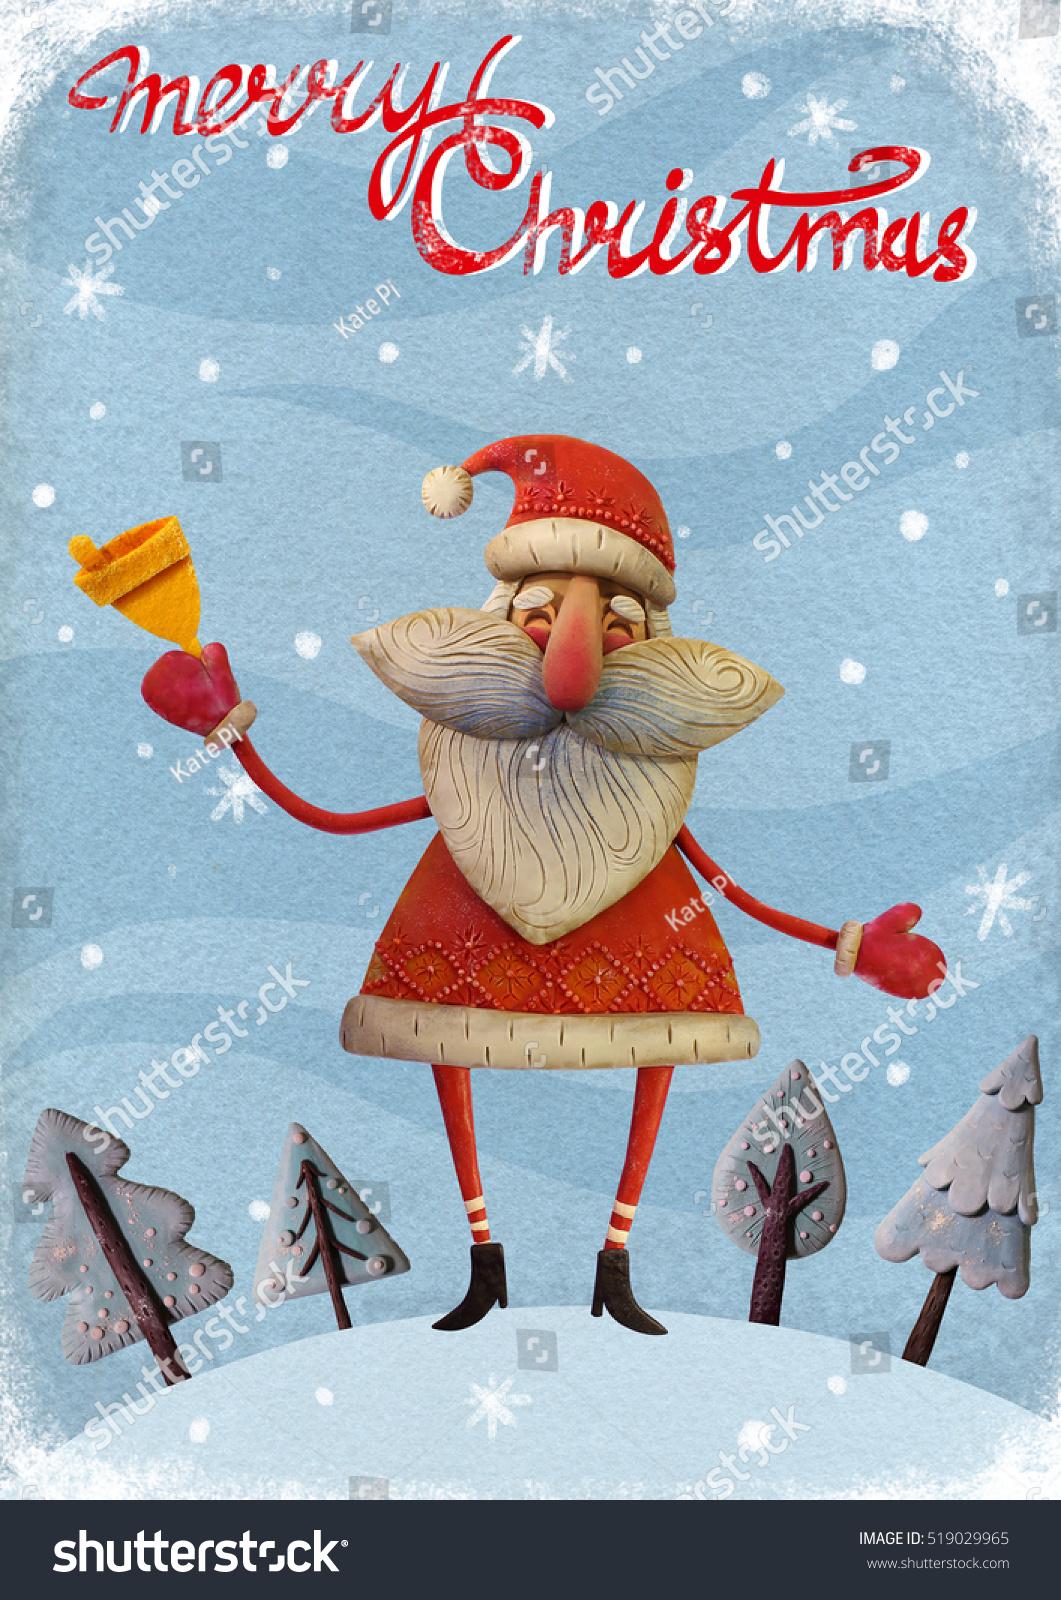 Handmade christmas greeting card santa claus stock illustration handmade christmas greeting card with santa claus ringing bell santa claus with a bell in kristyandbryce Gallery